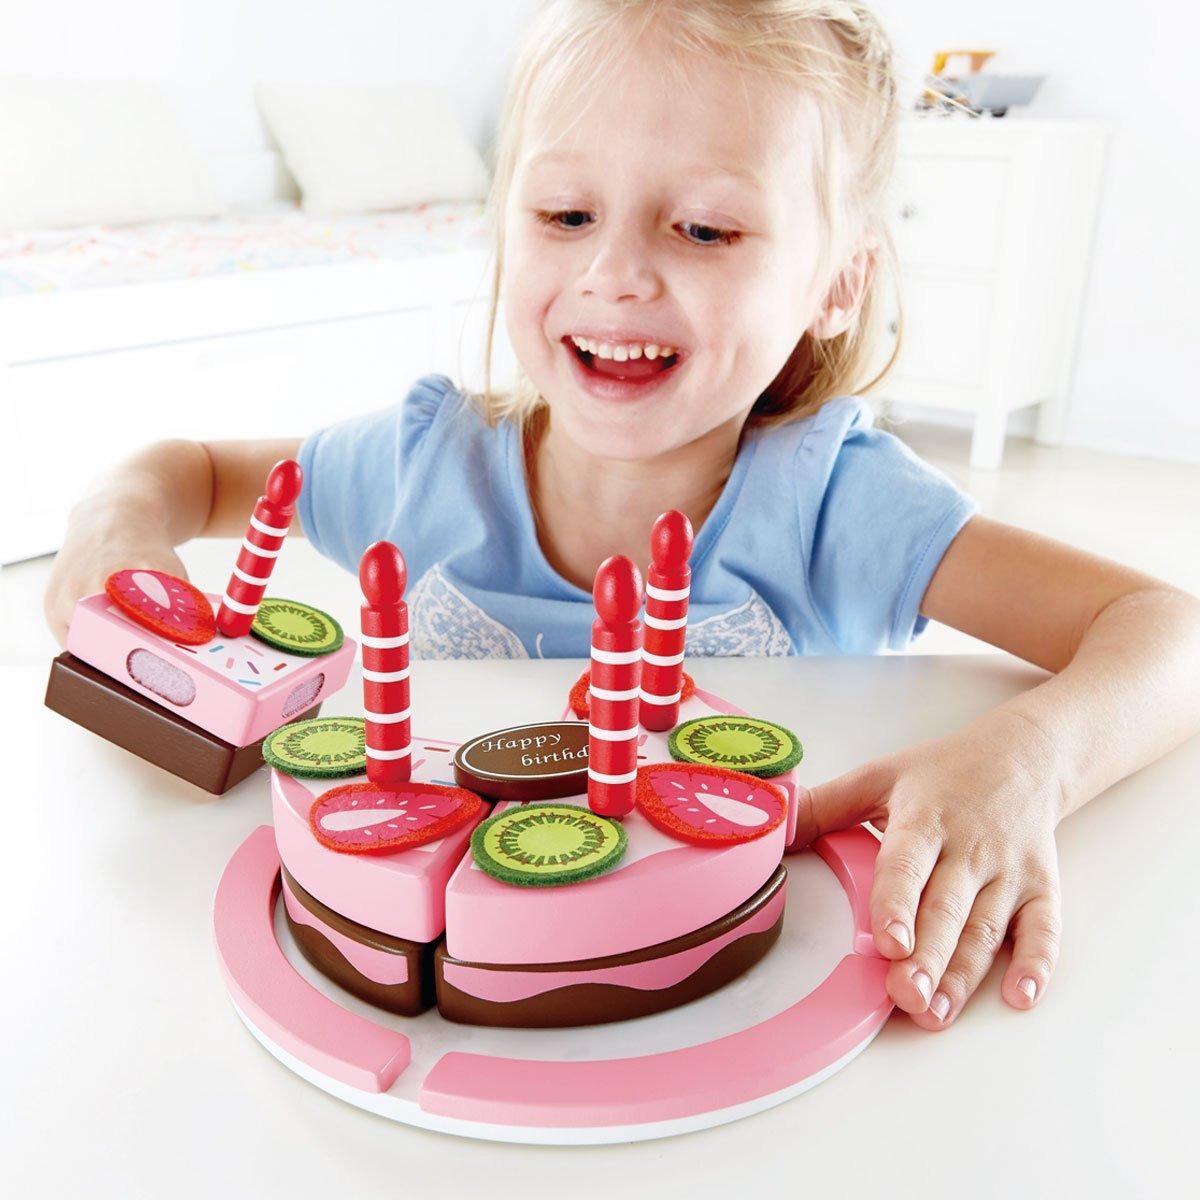 Fødselsdagskage